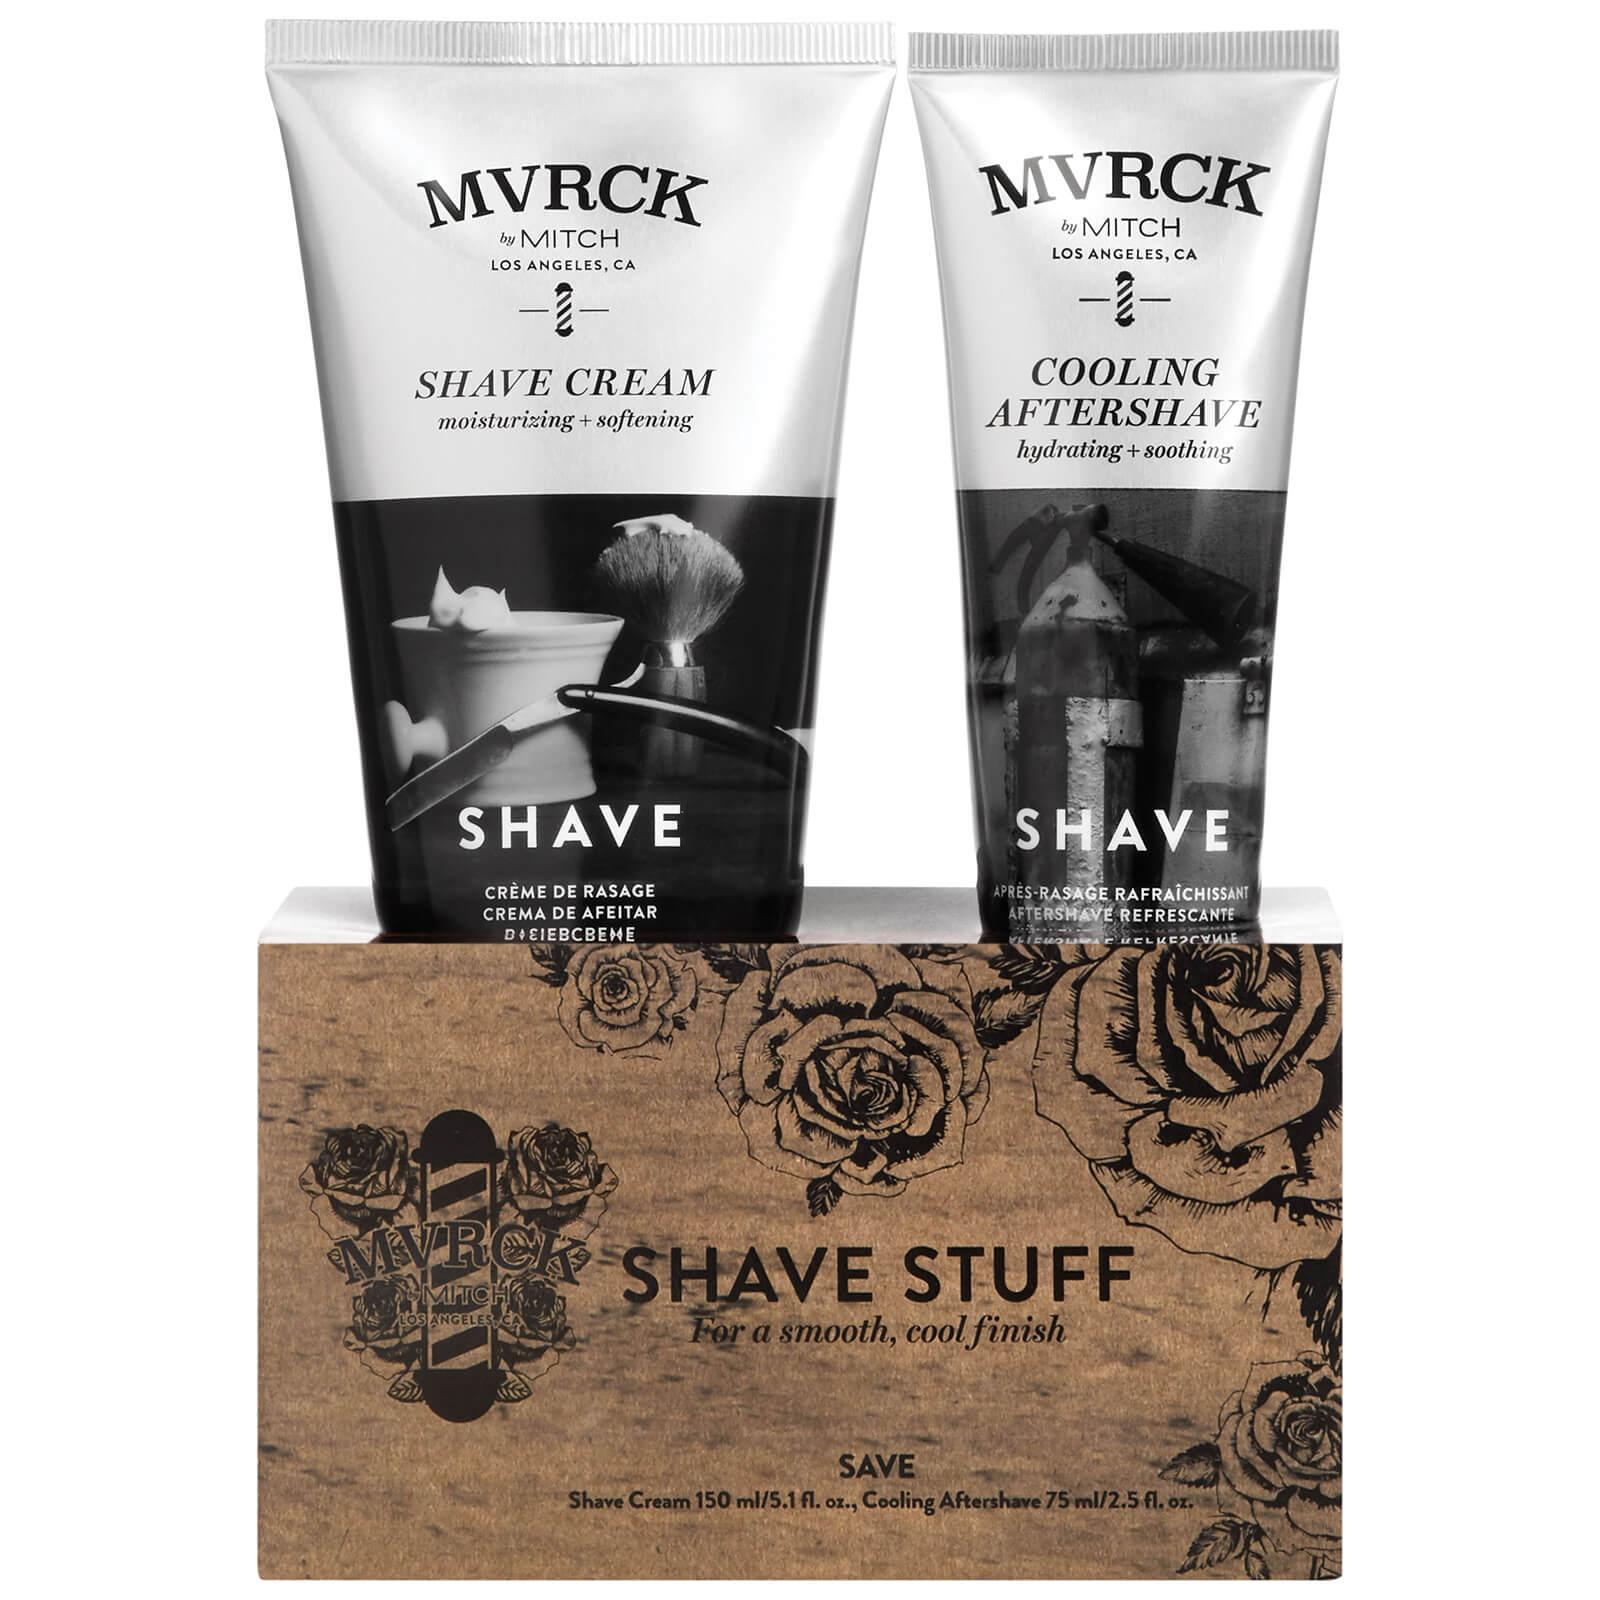 Paul Mitchell MVRCK Shave Stuff